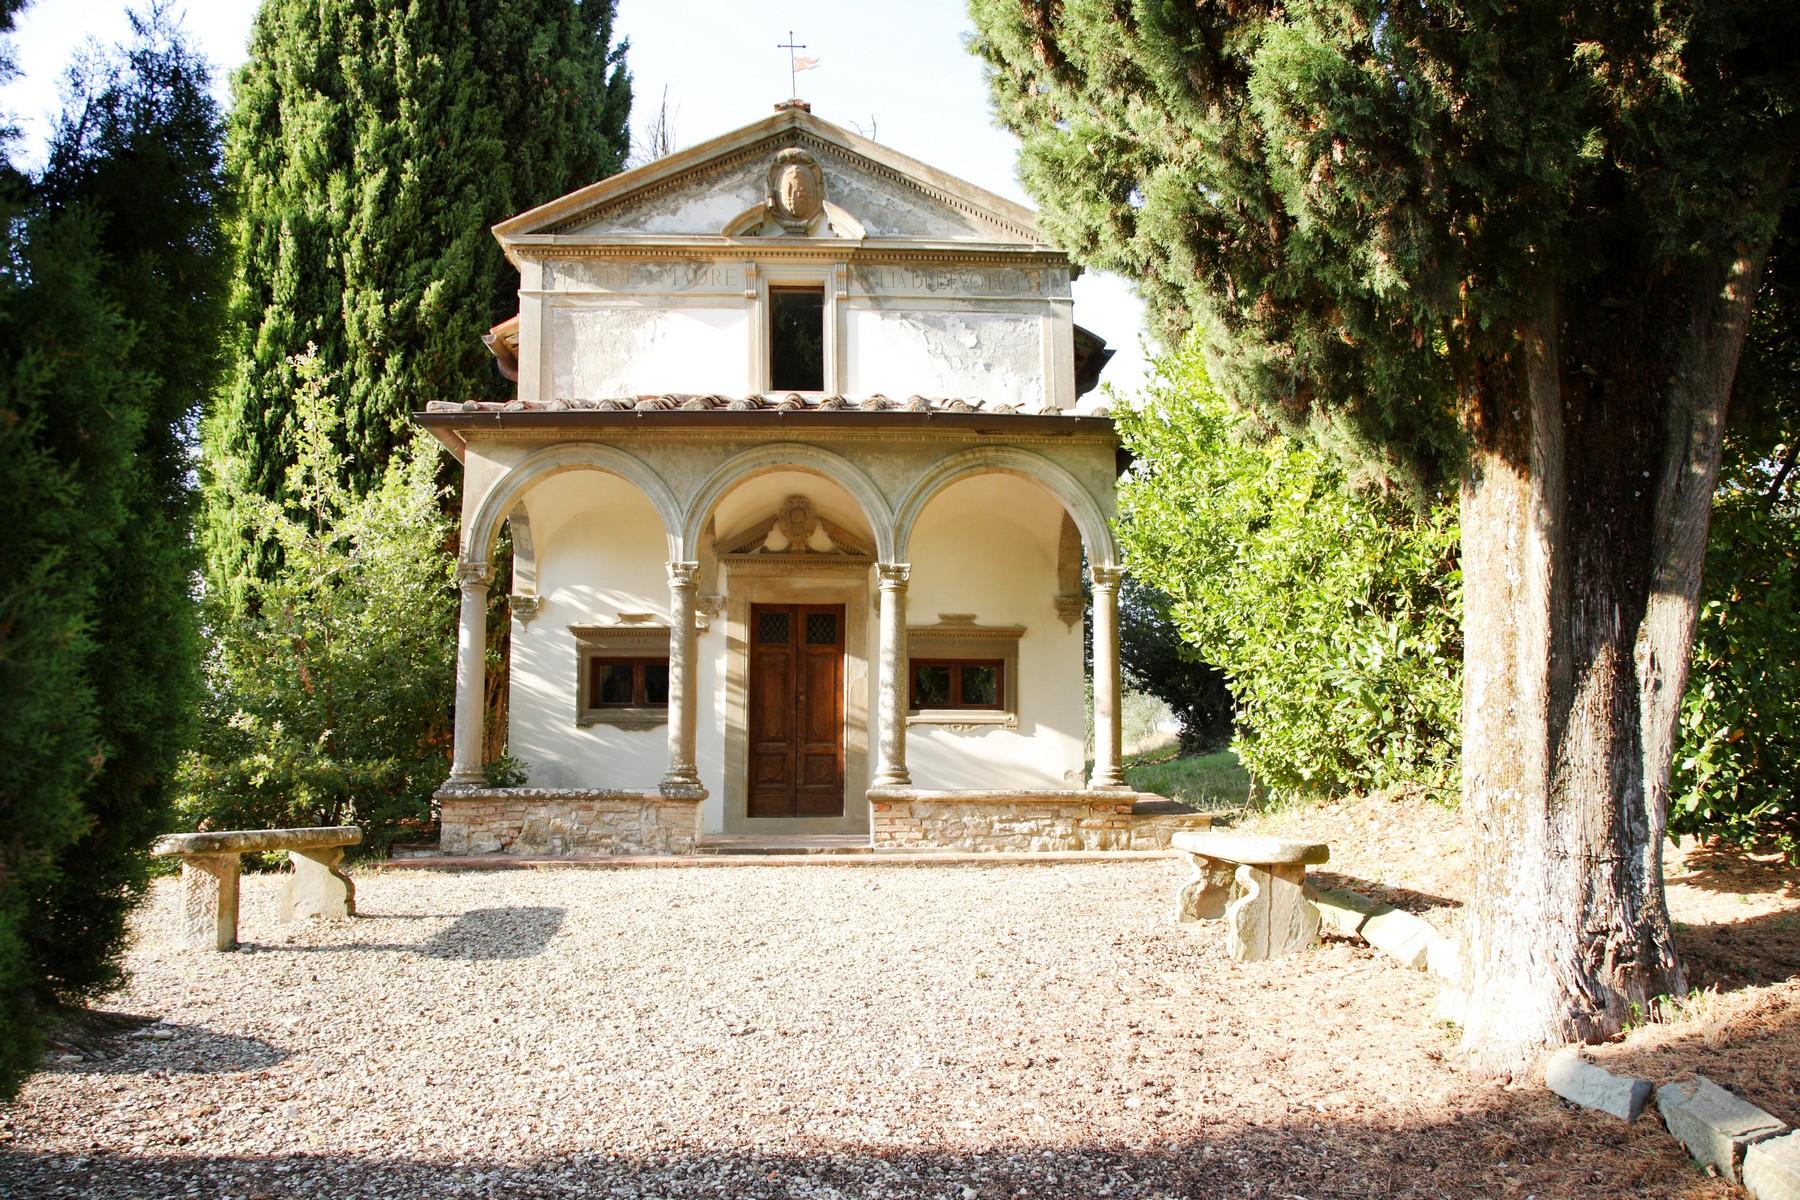 Villa in Vendita a Gaiole In Chianti: 5 locali, 4285 mq - Foto 3